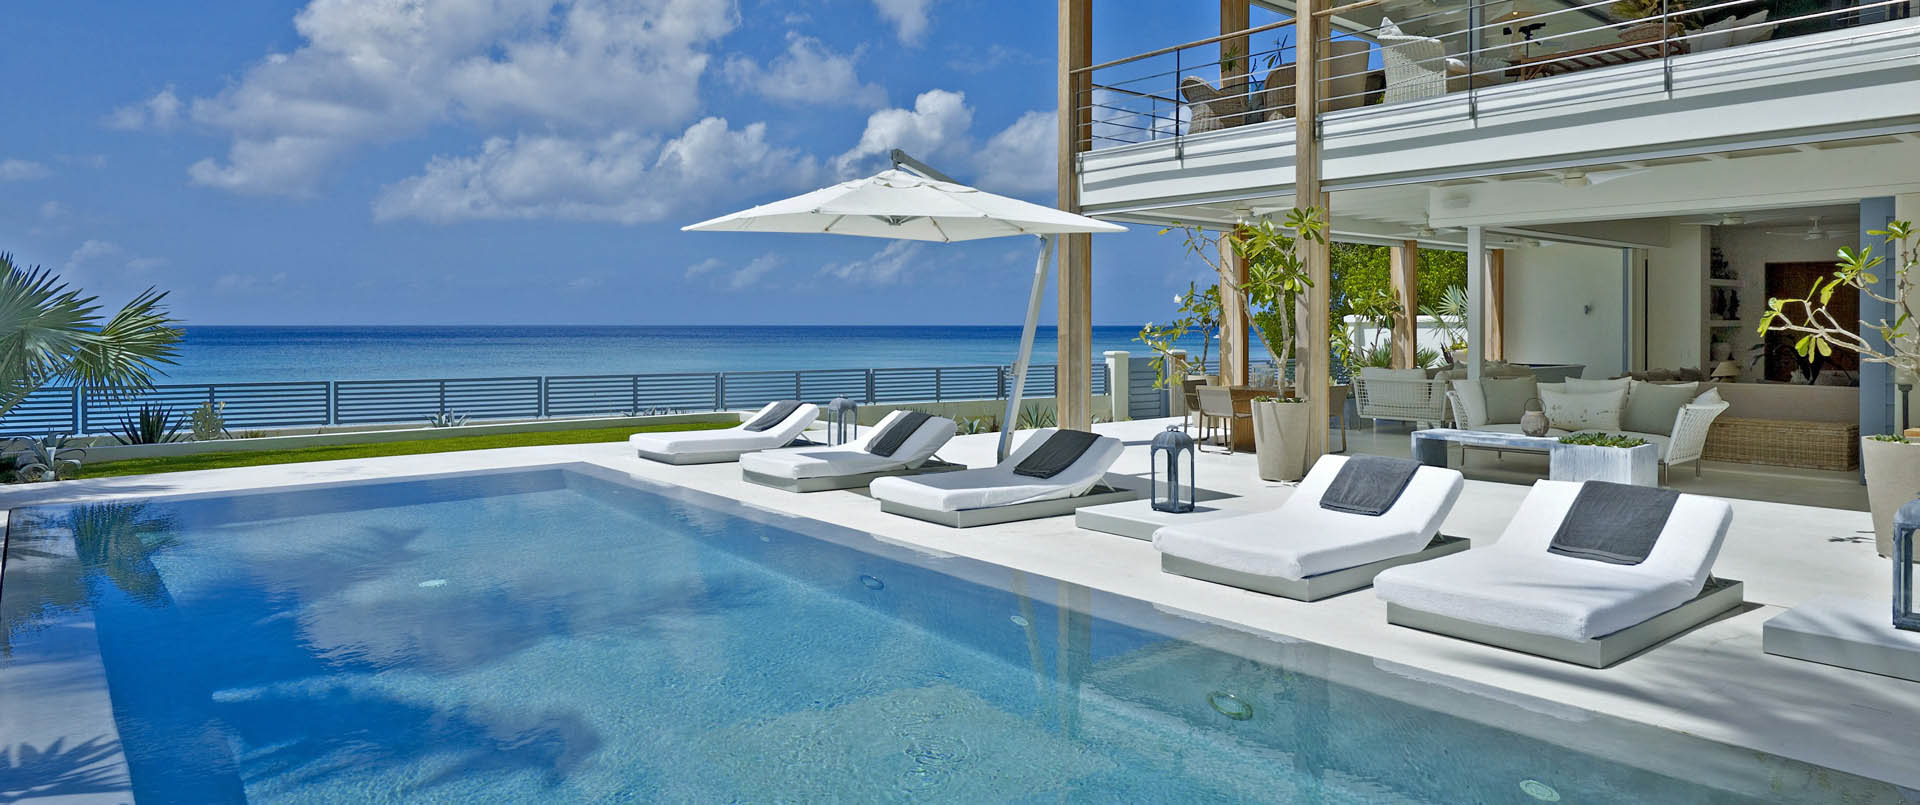 Exceptional Villas Luxury Travel Blog